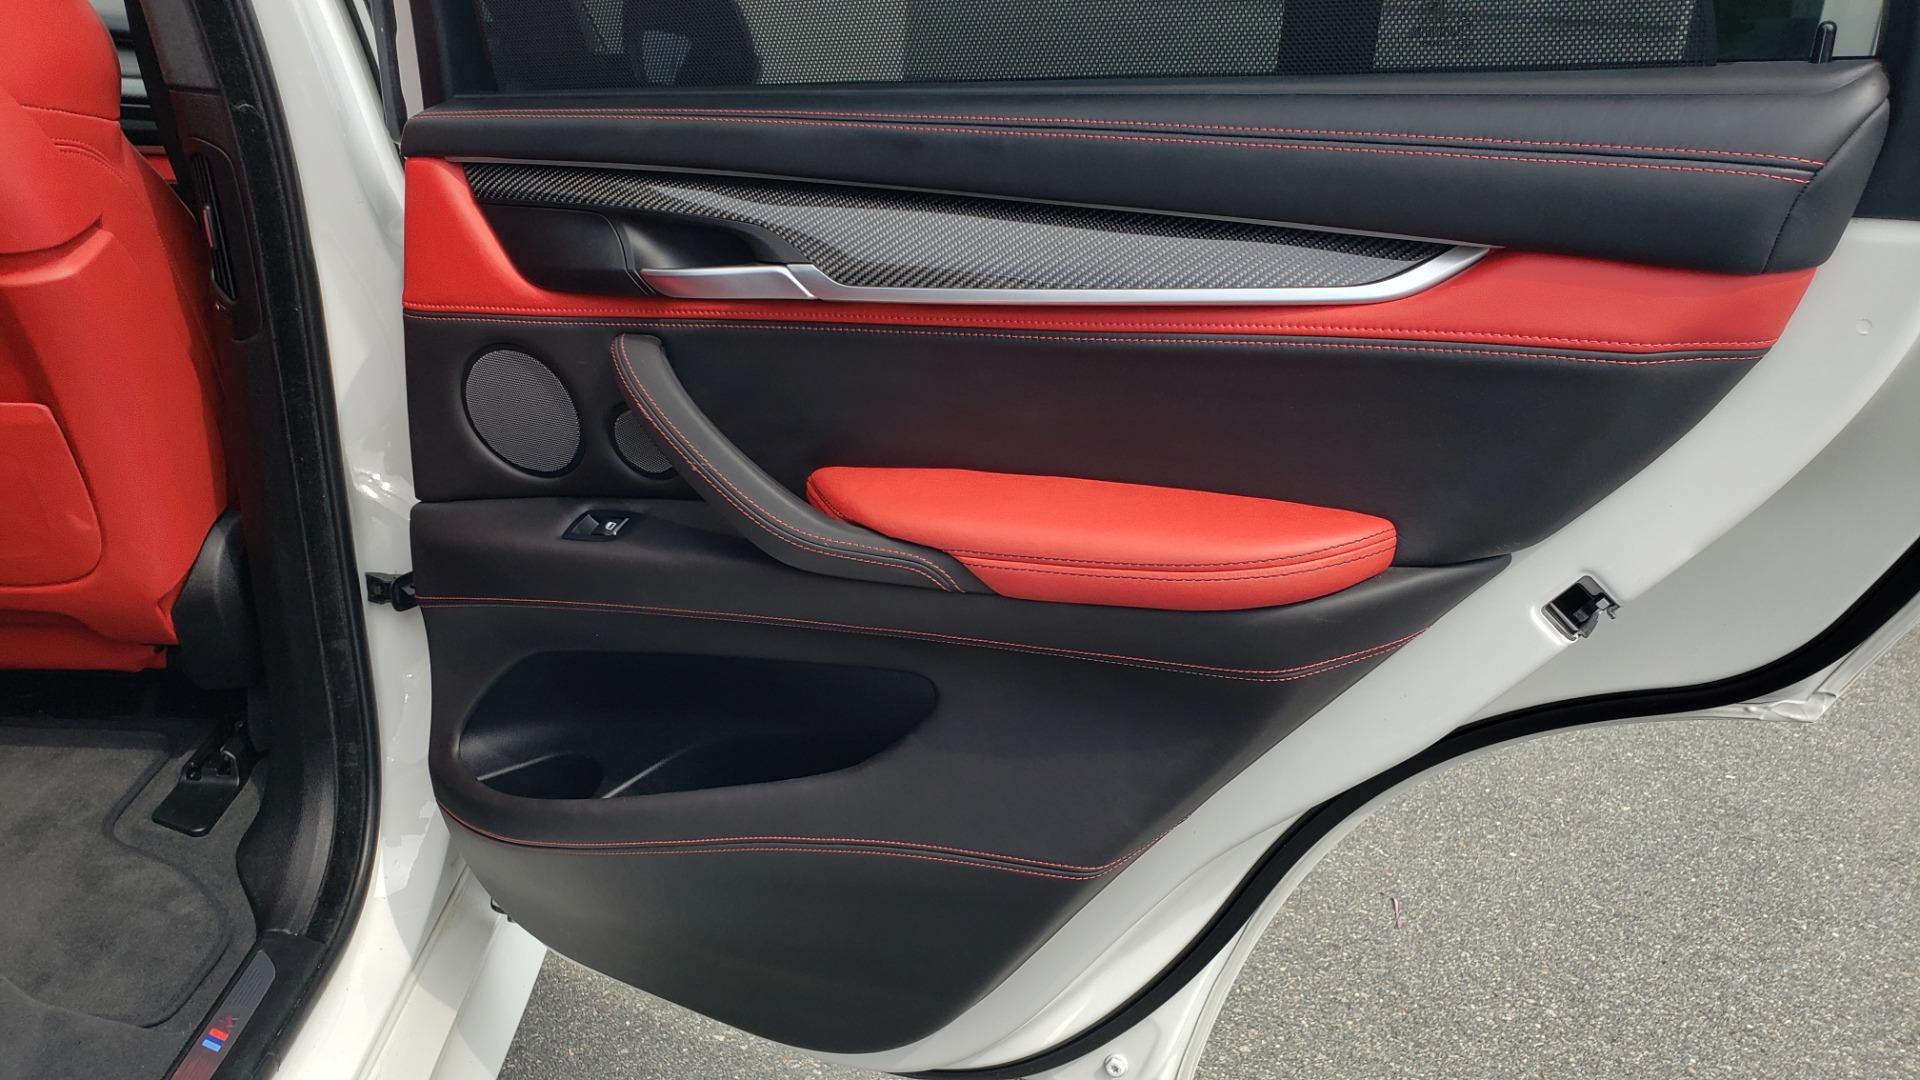 Used 2017 BMW X5 M EXECUTIVE PKG / NAV / DRVR ASST / BSM / HUD / HTD STS / WIFI for sale Sold at Formula Imports in Charlotte NC 28227 74